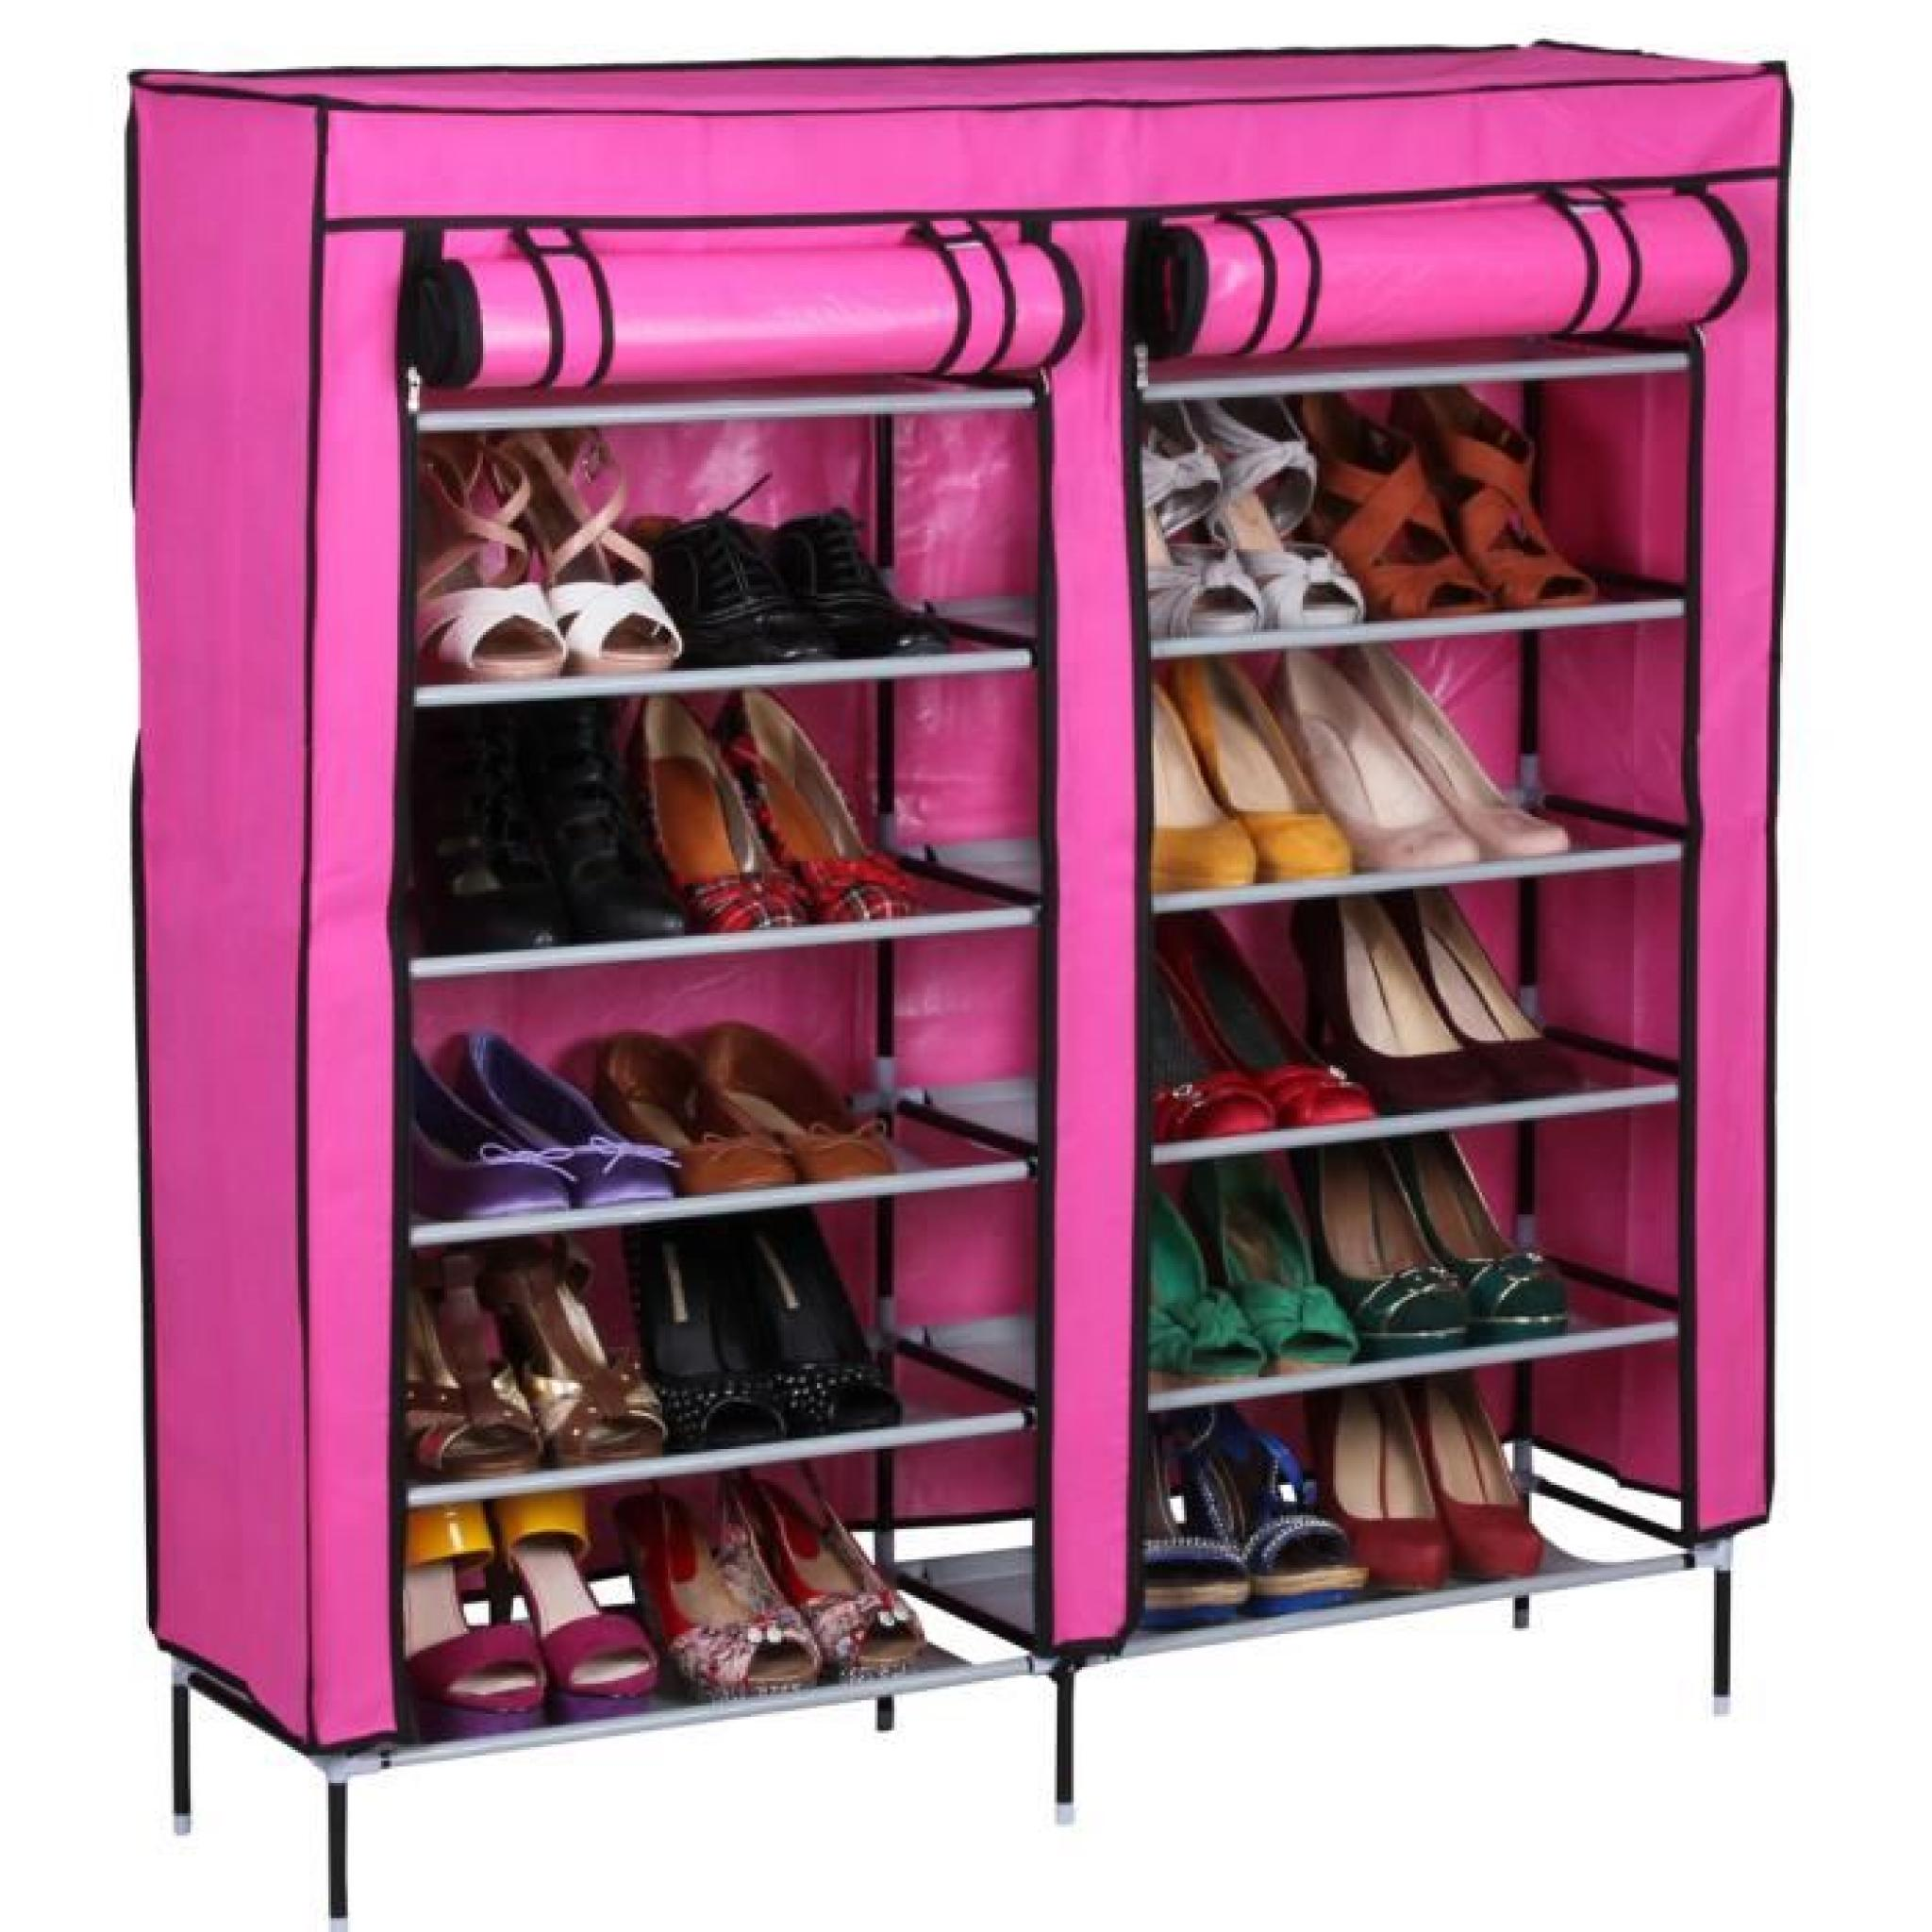 Meuble Chaussures Couleur Rose Dim 118 X 110 X 30 Cm